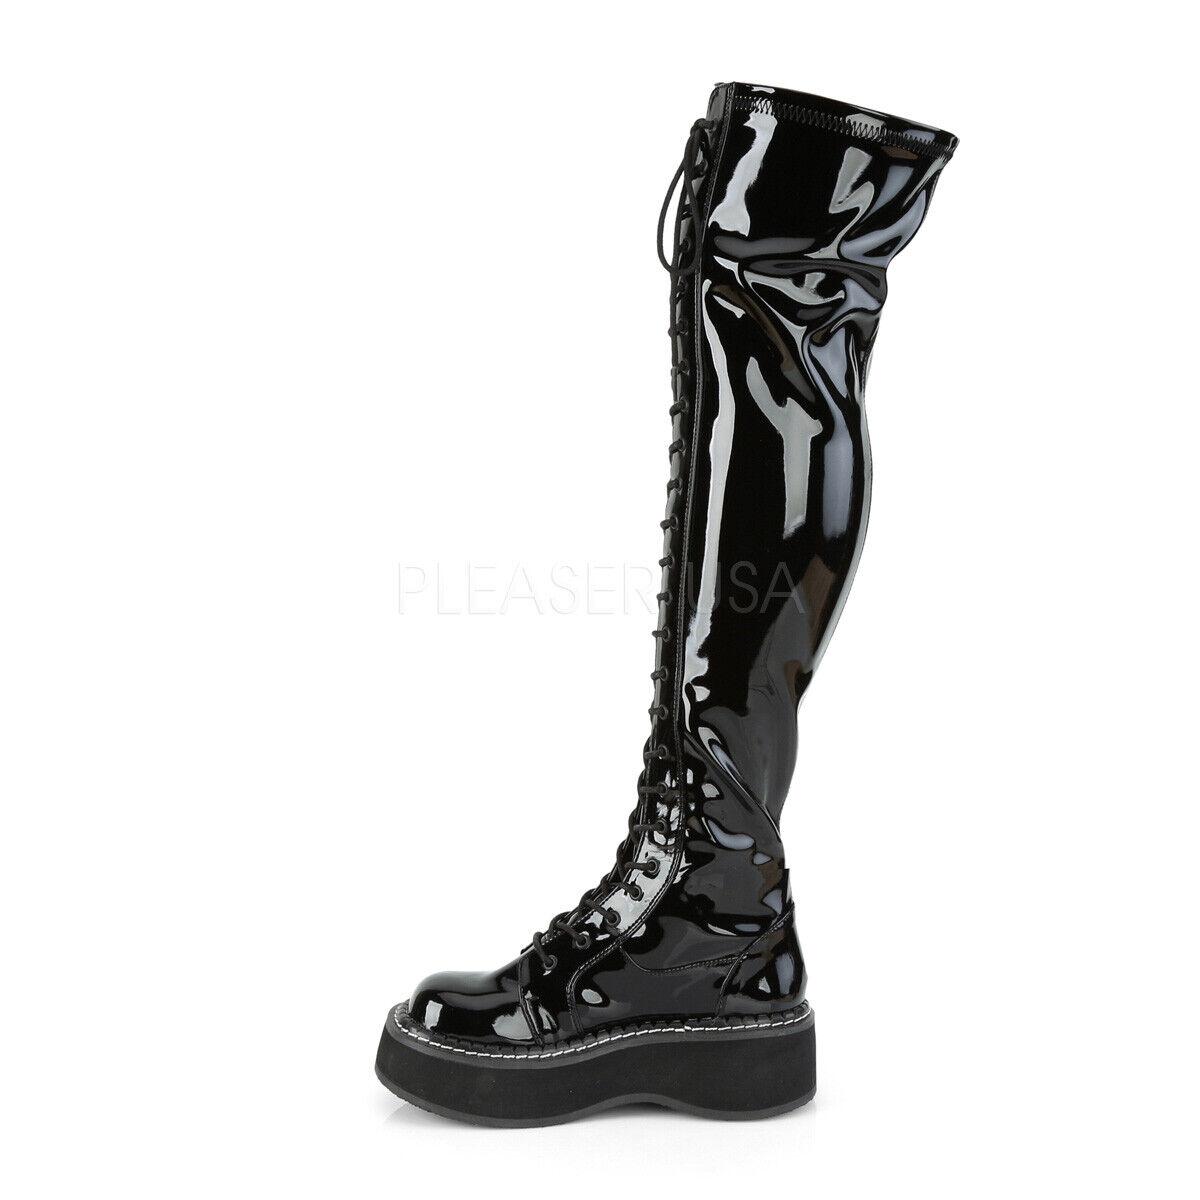 Emily 375 Stretch nero Patent Lace Up & Zipper 2  Platform Thigh avvio 6-12